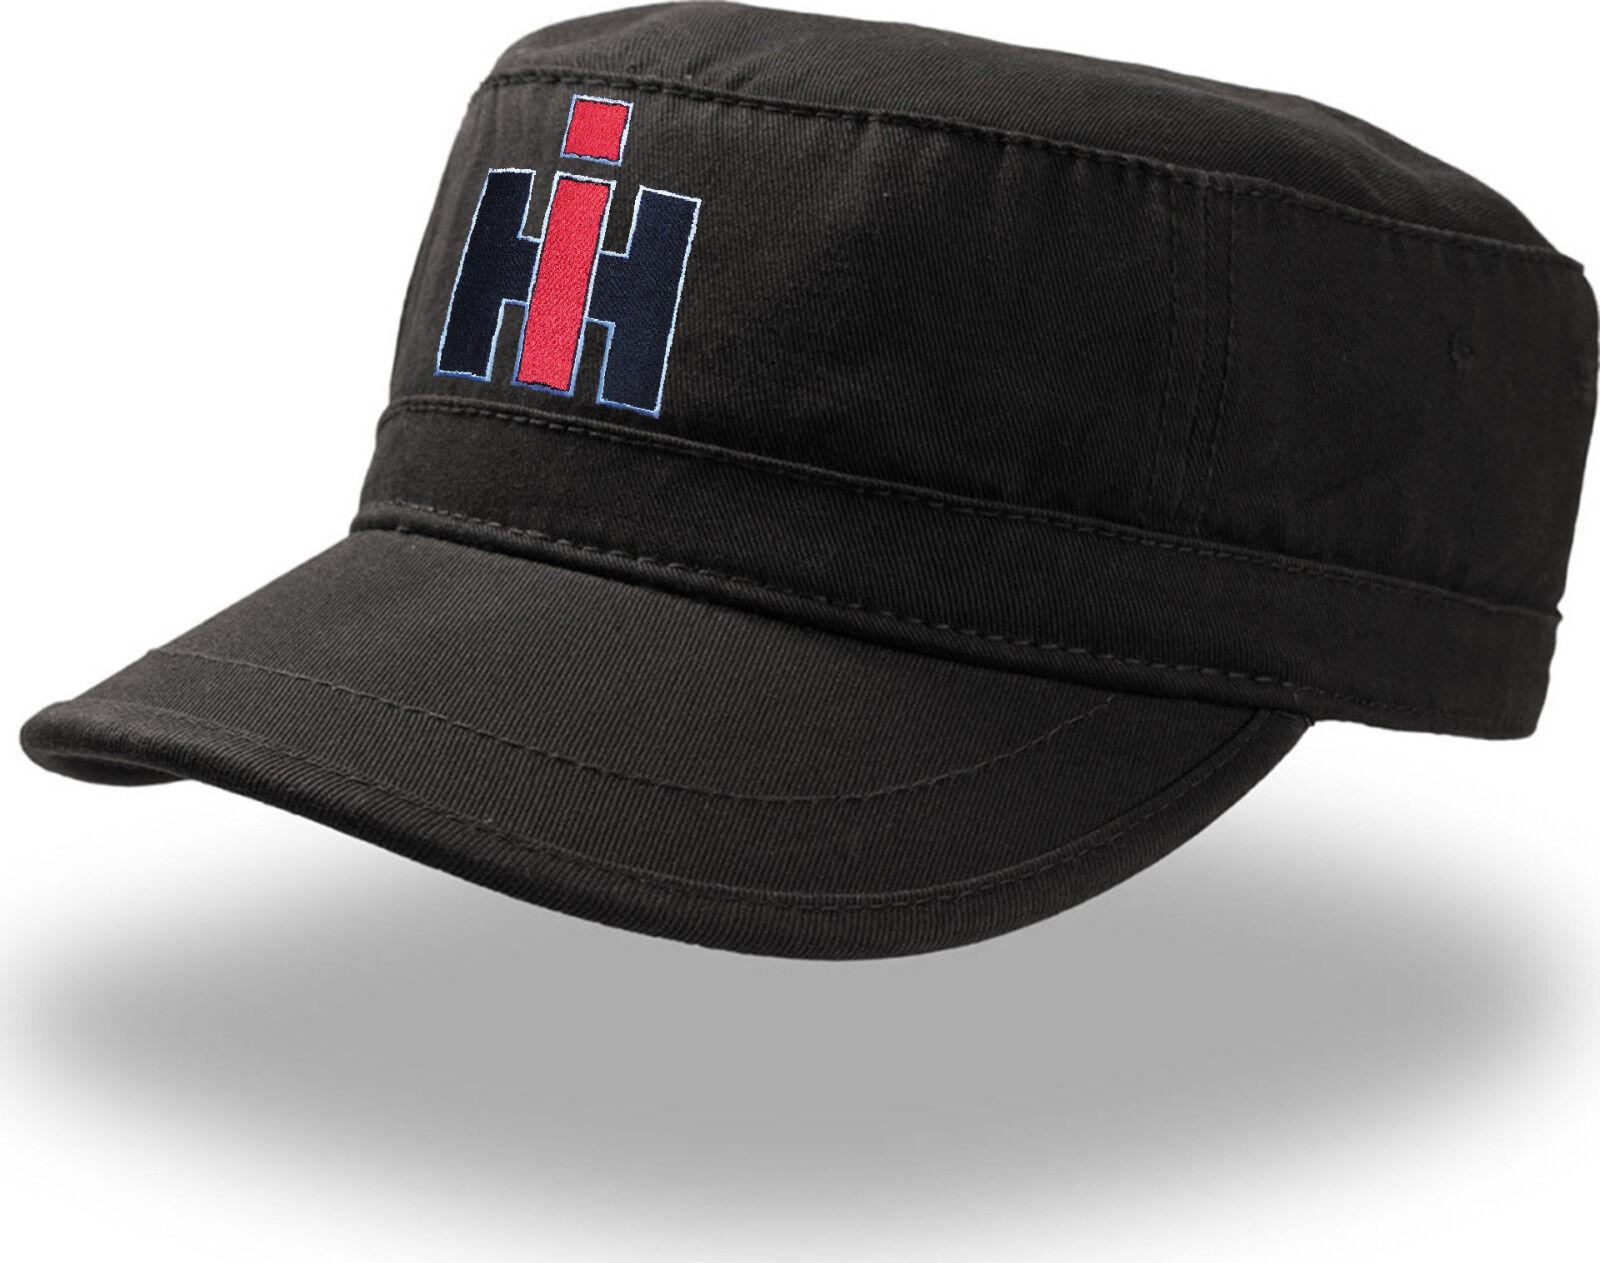 Warrior Cuba-Cap Kappe Mütze Military bestickt mit IHC -  Logo, Namenszug